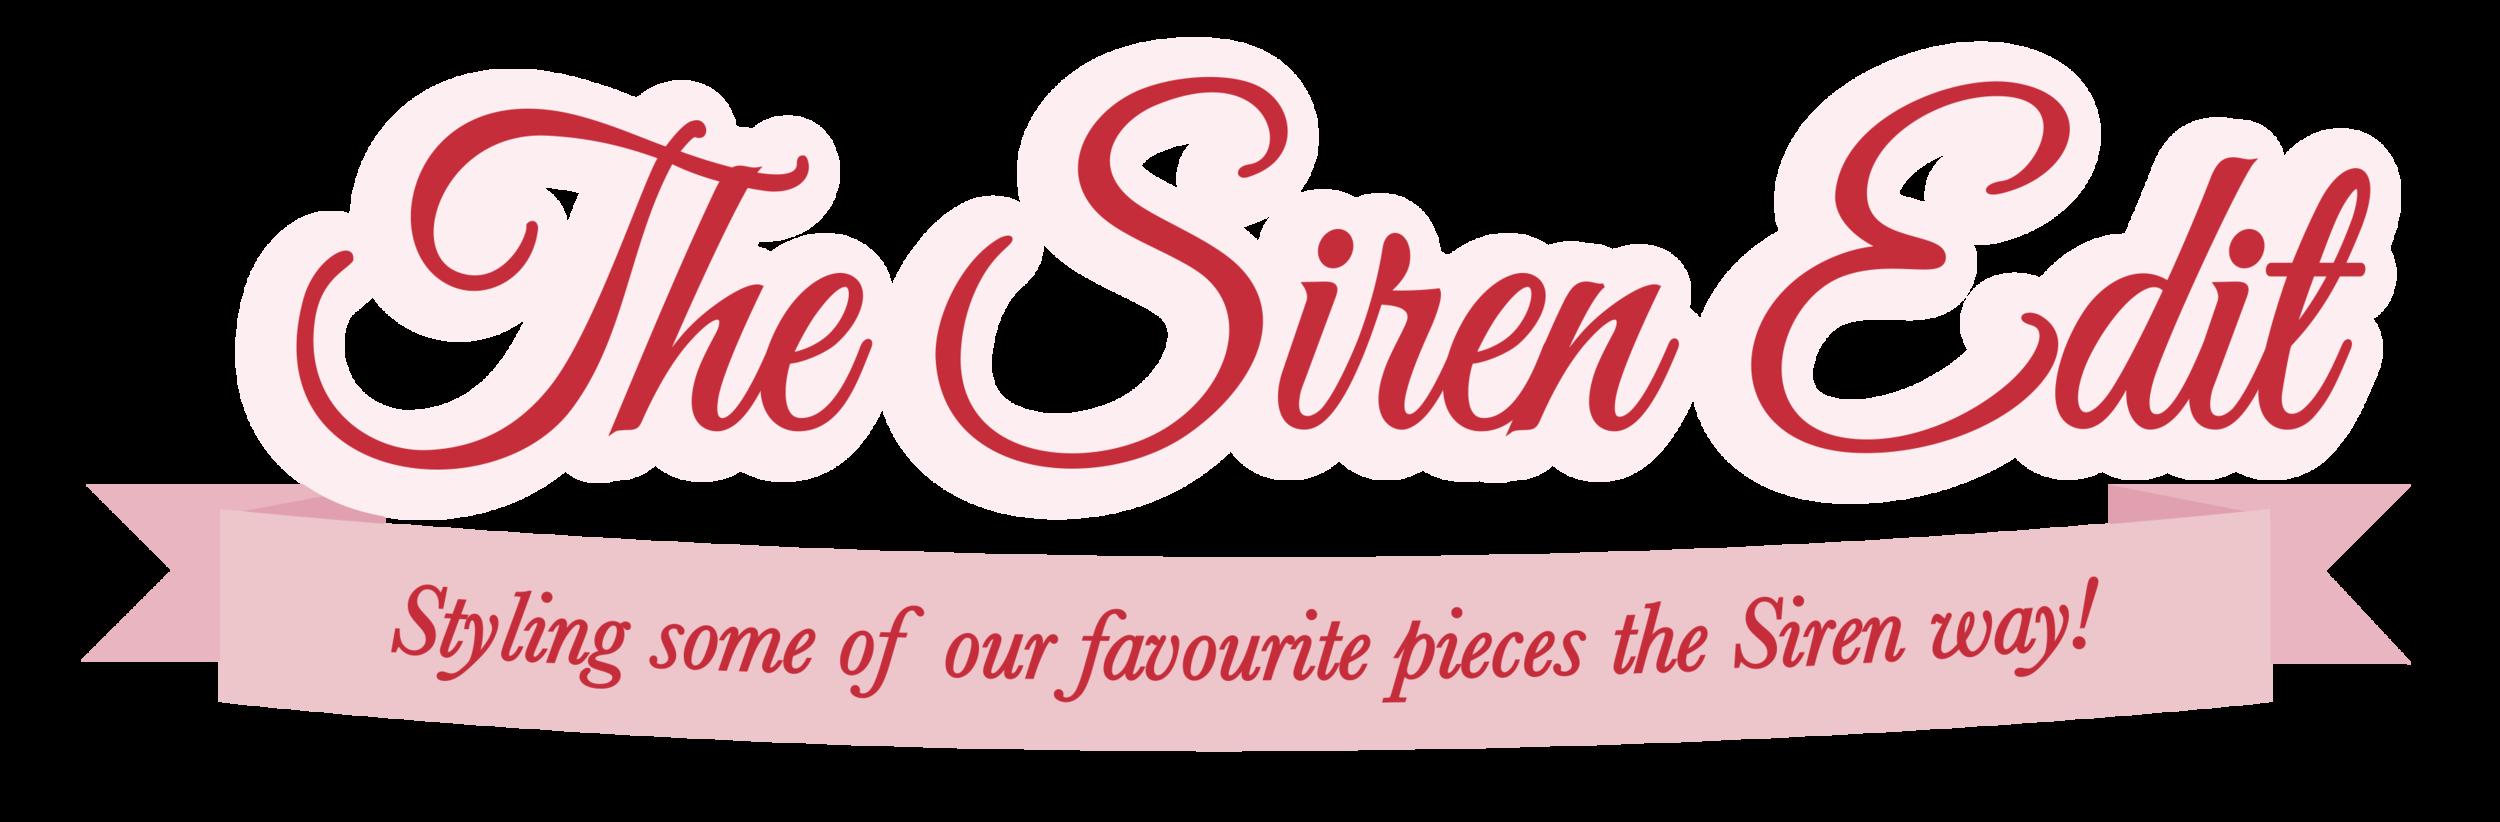 Siren-edit-title.png